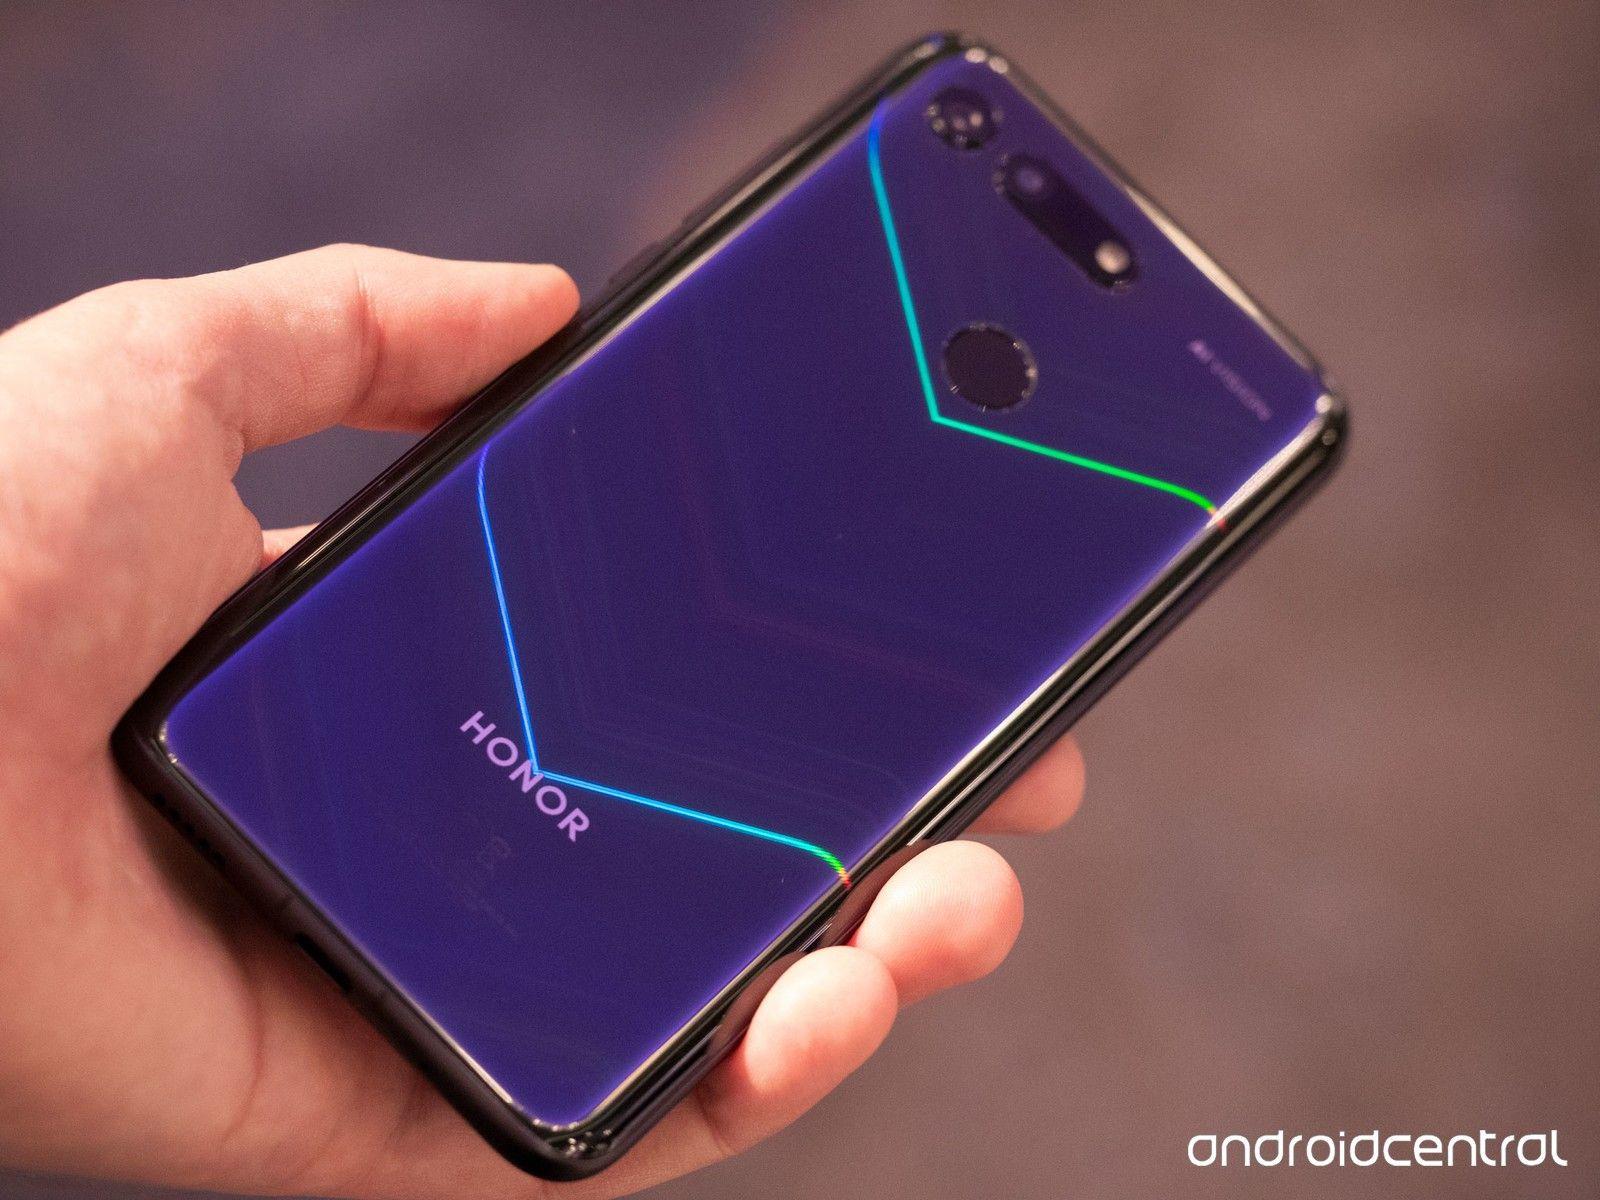 Huawei Honor V20 (View 20) black global 6/128 - Sony IMX586 48MPX + 3D TOF, dziurka zamiast notcha